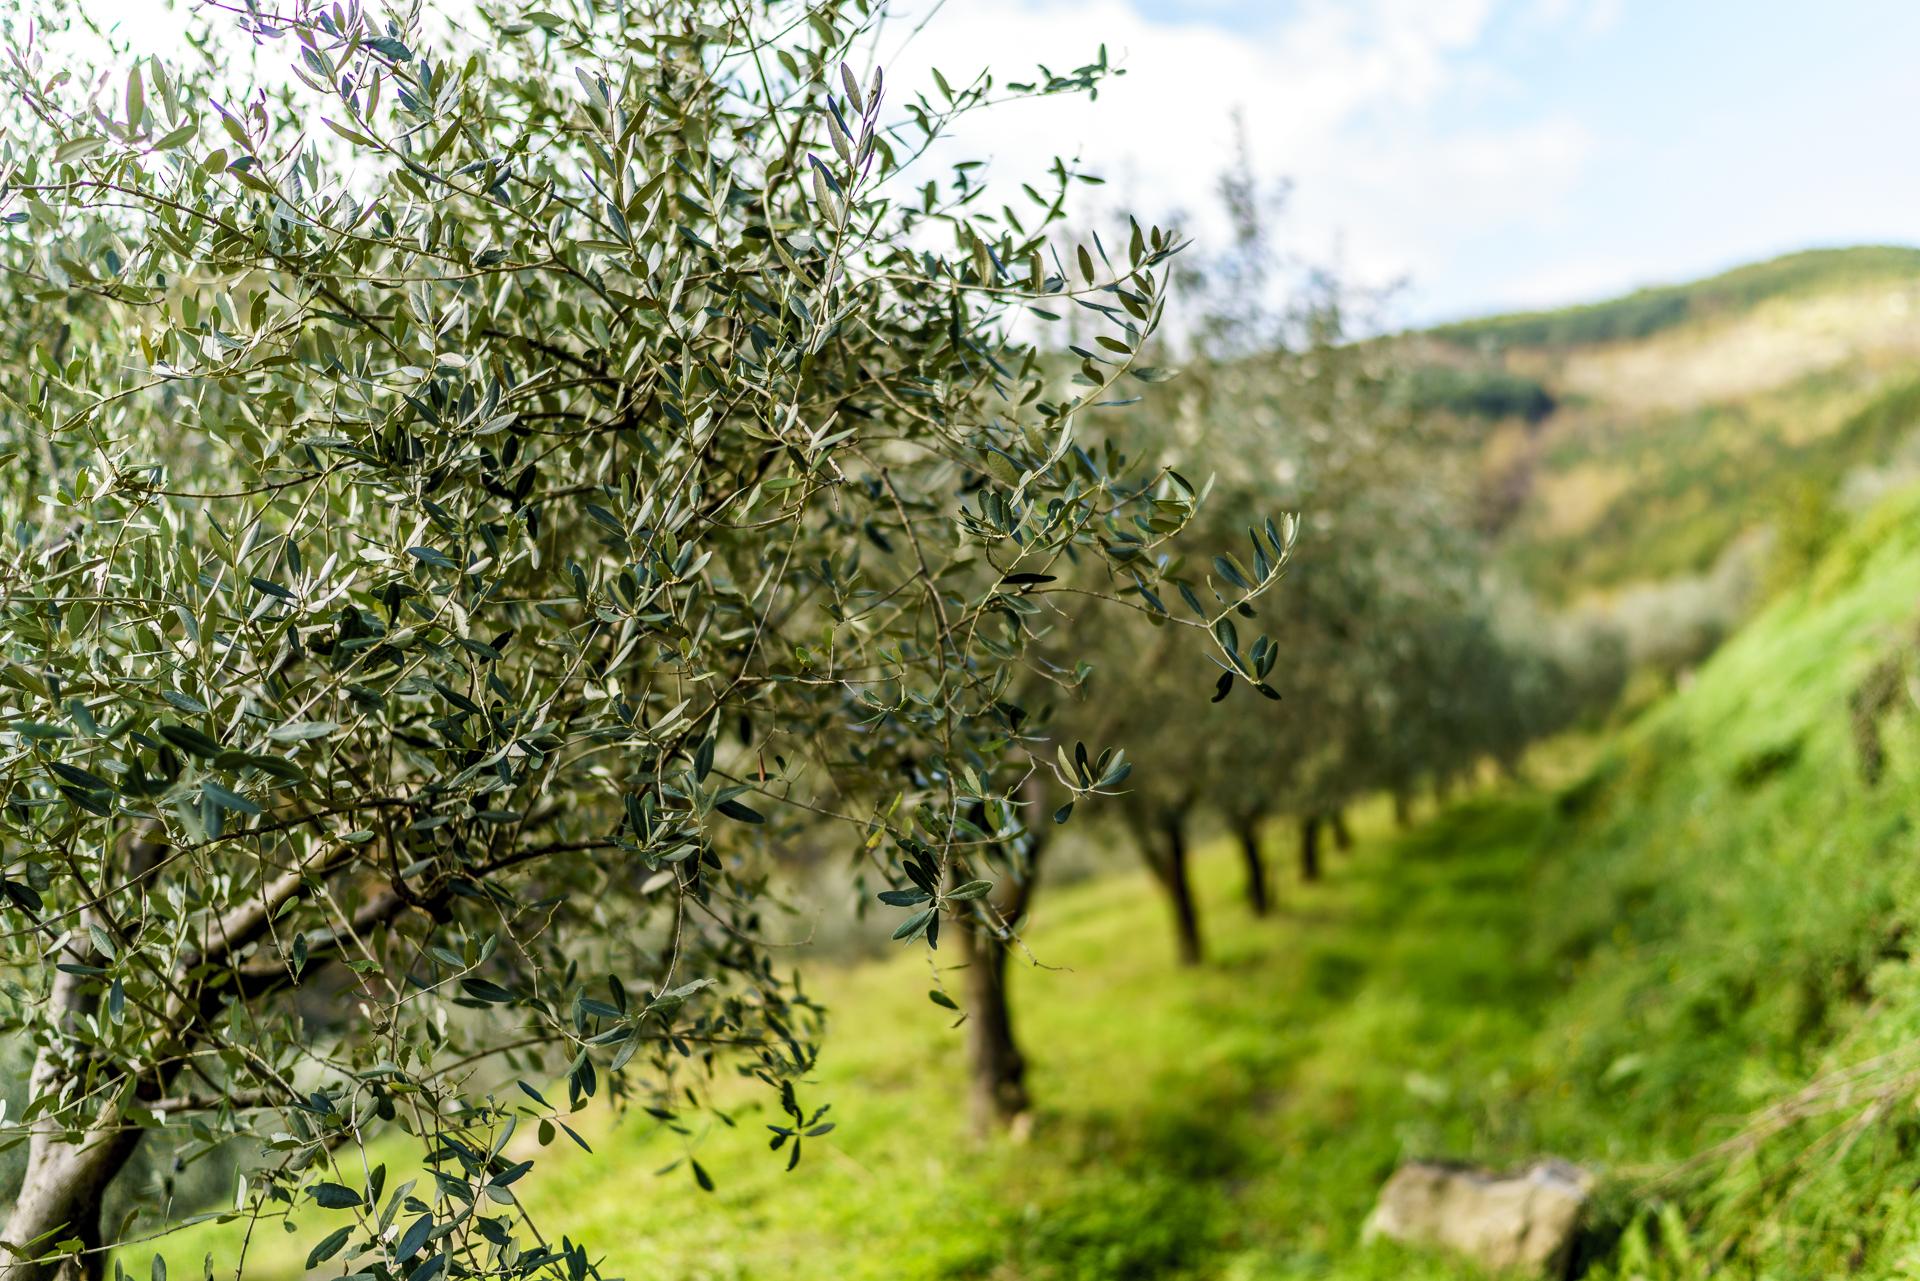 ipsa-olivenoel-spitzenklasse